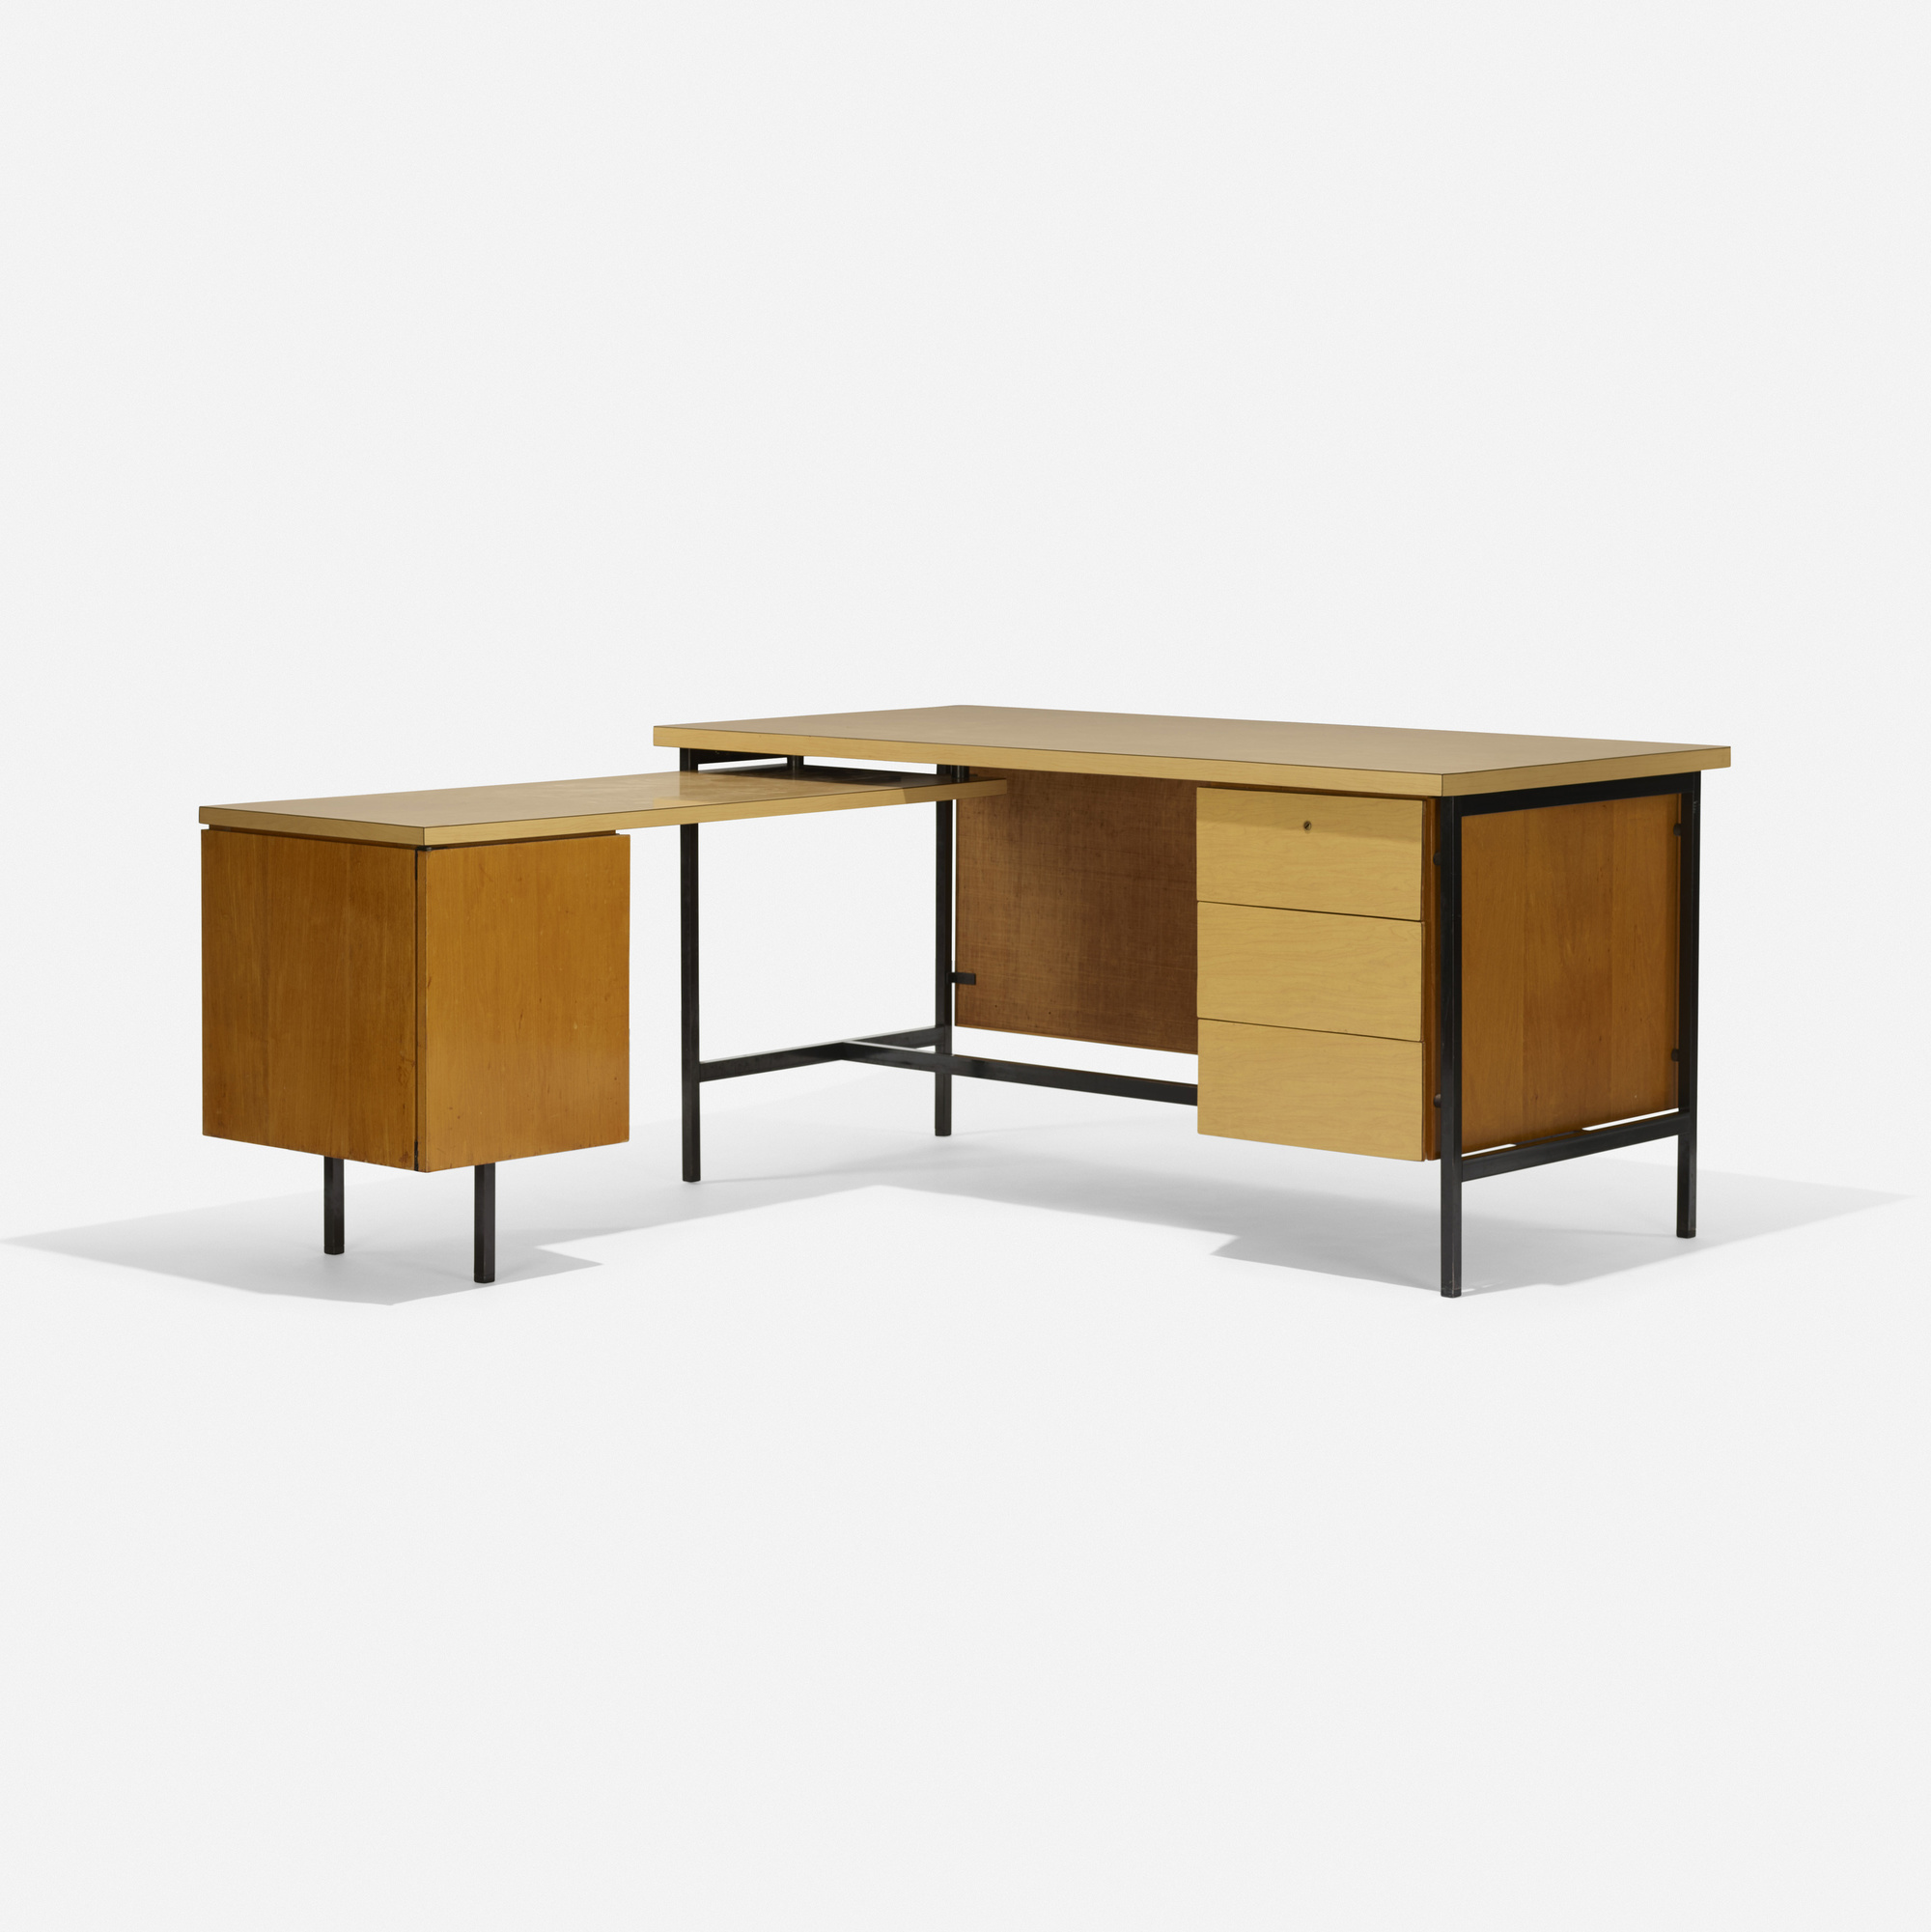 151 Florence Knoll Secretarial Desk Model 1543 1 Of 3